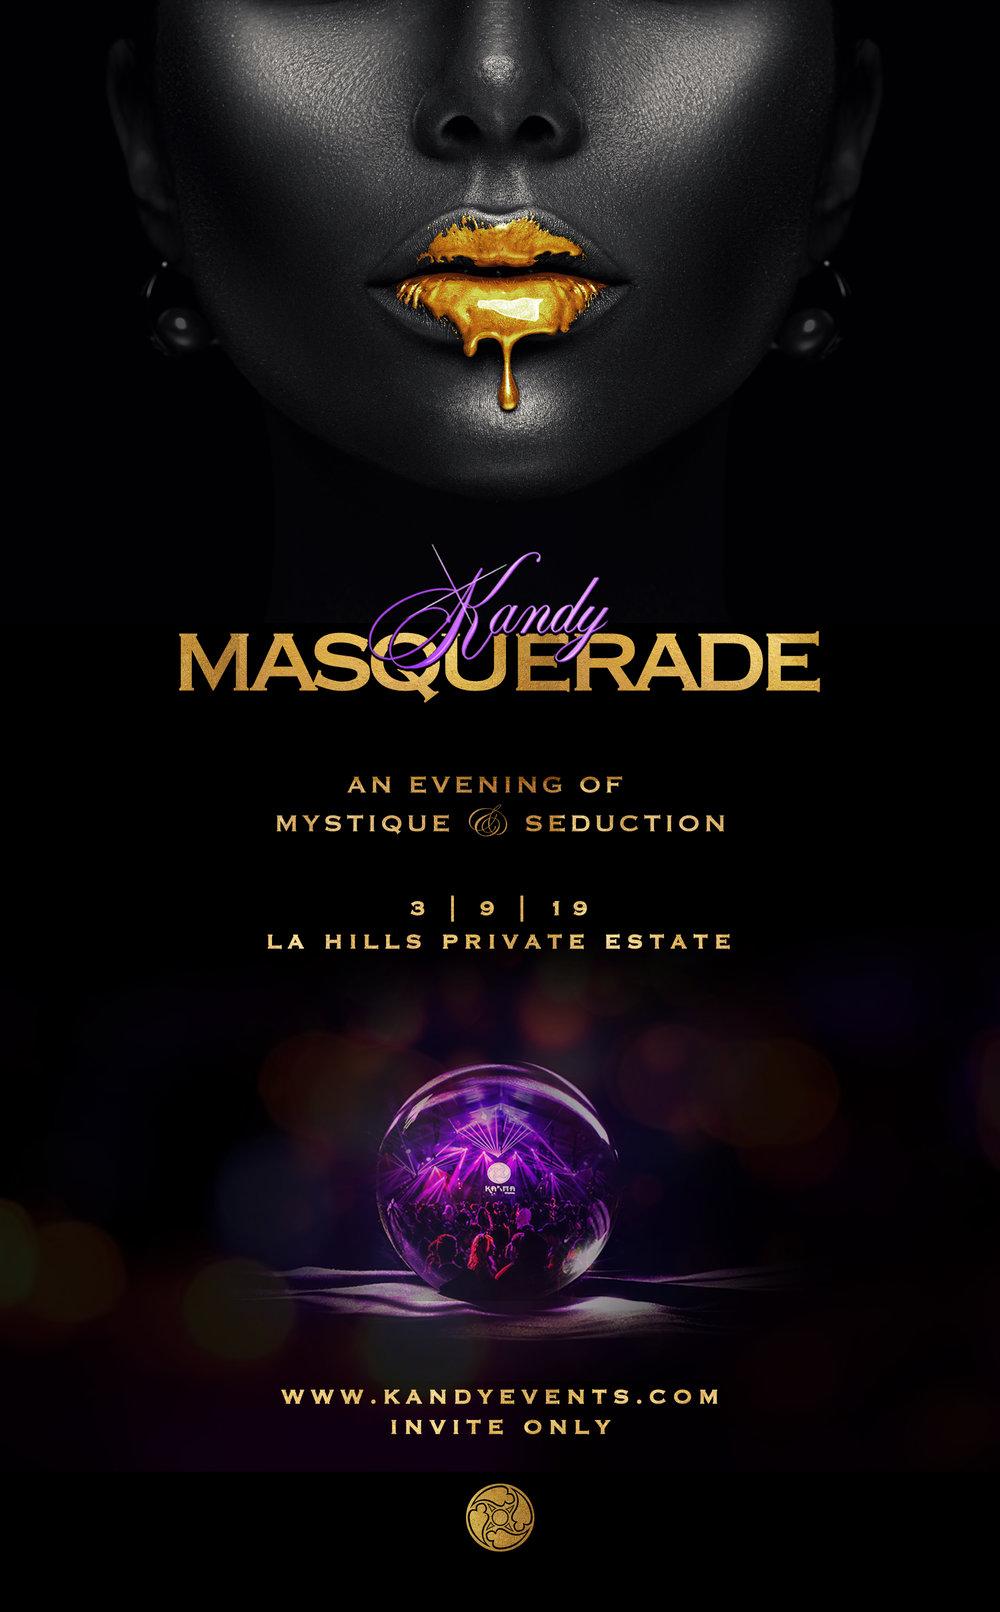 Masquerade2019_2.jpg